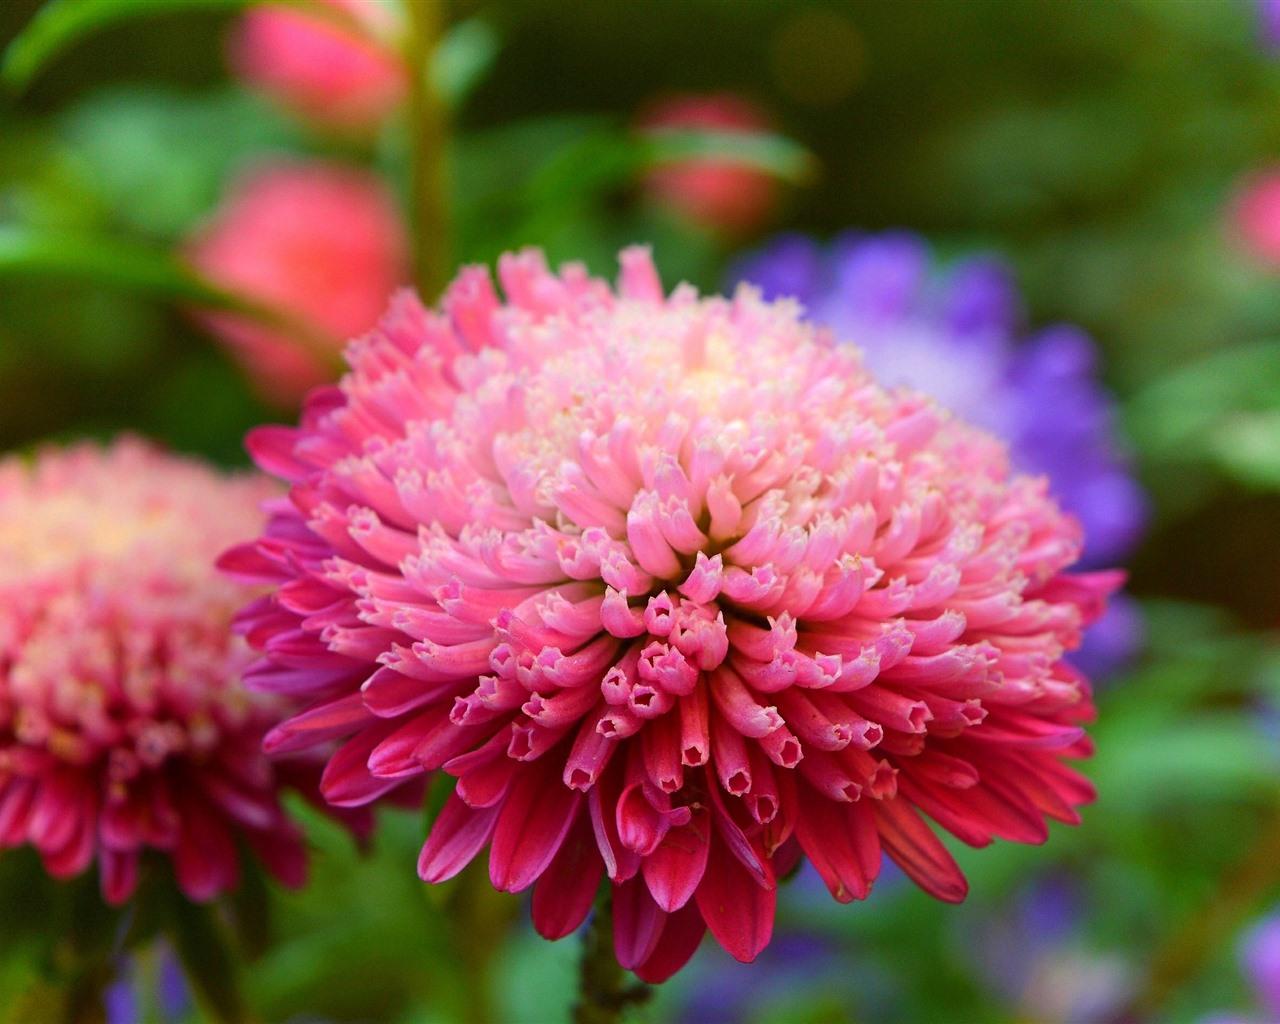 Pink Flower Macro Photography, Petals, Chamomile 828x1792